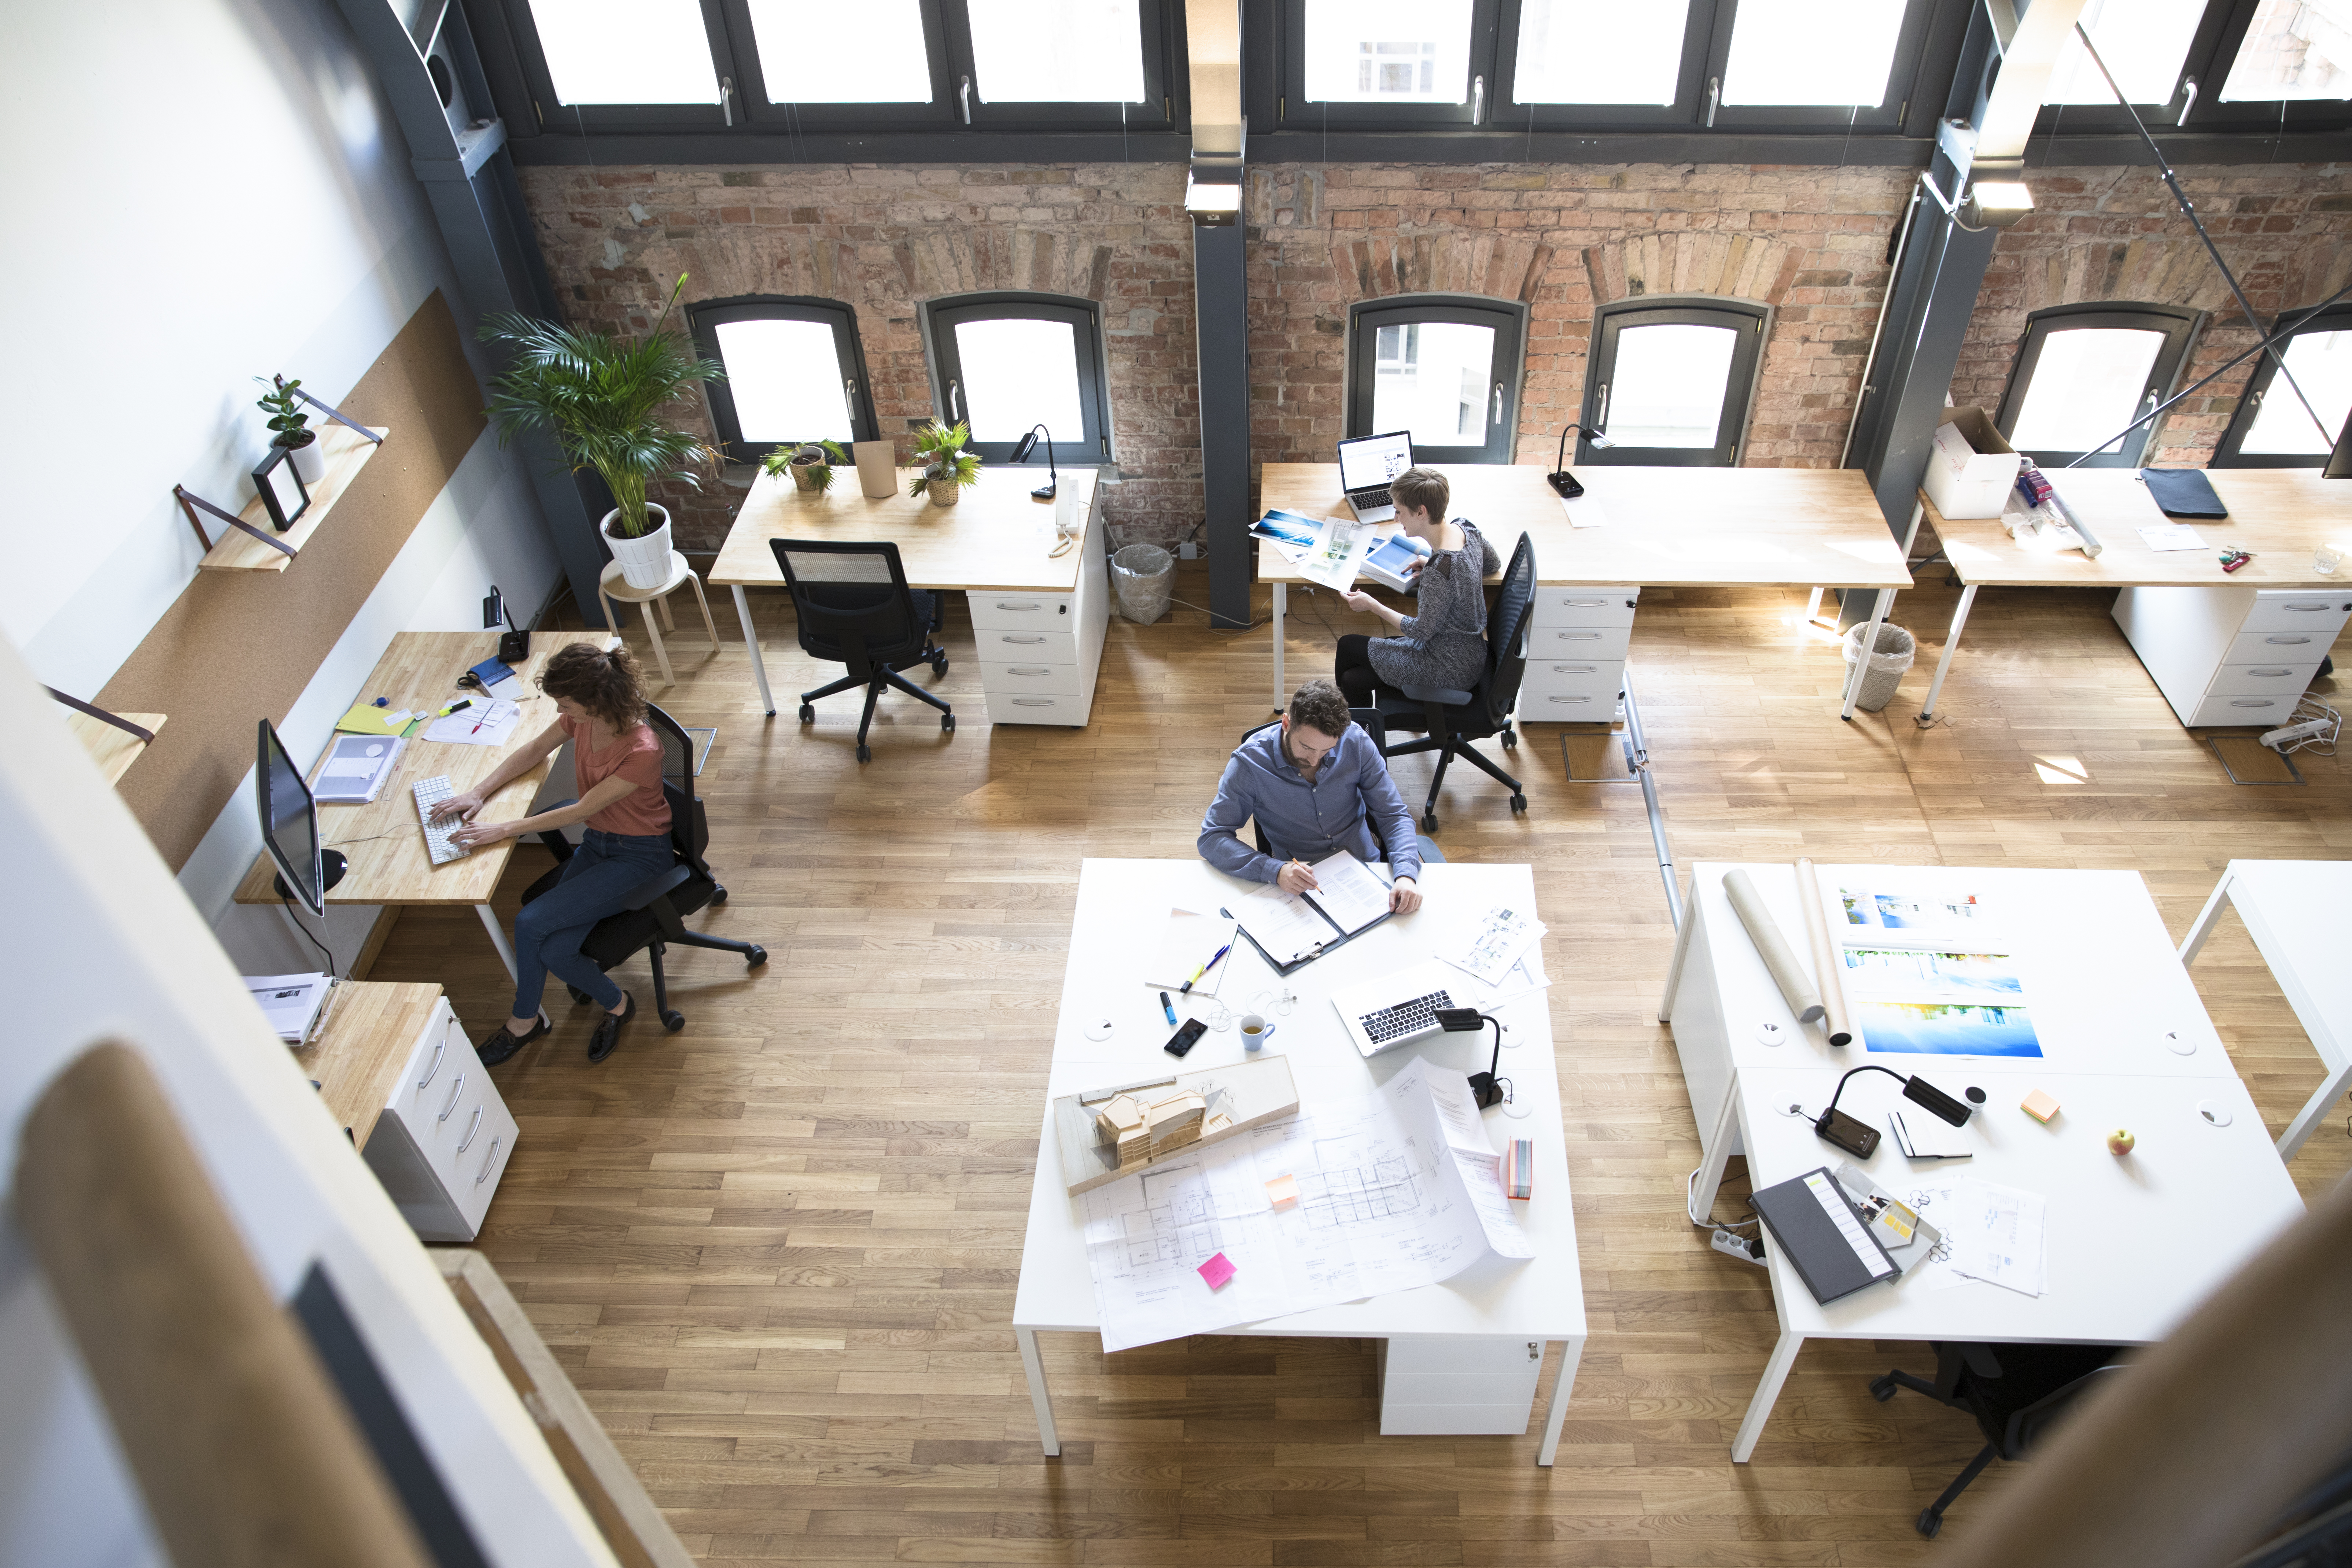 Coworking / flex office , undefined - Coworking Spaces in Hamburg mieten  - 20